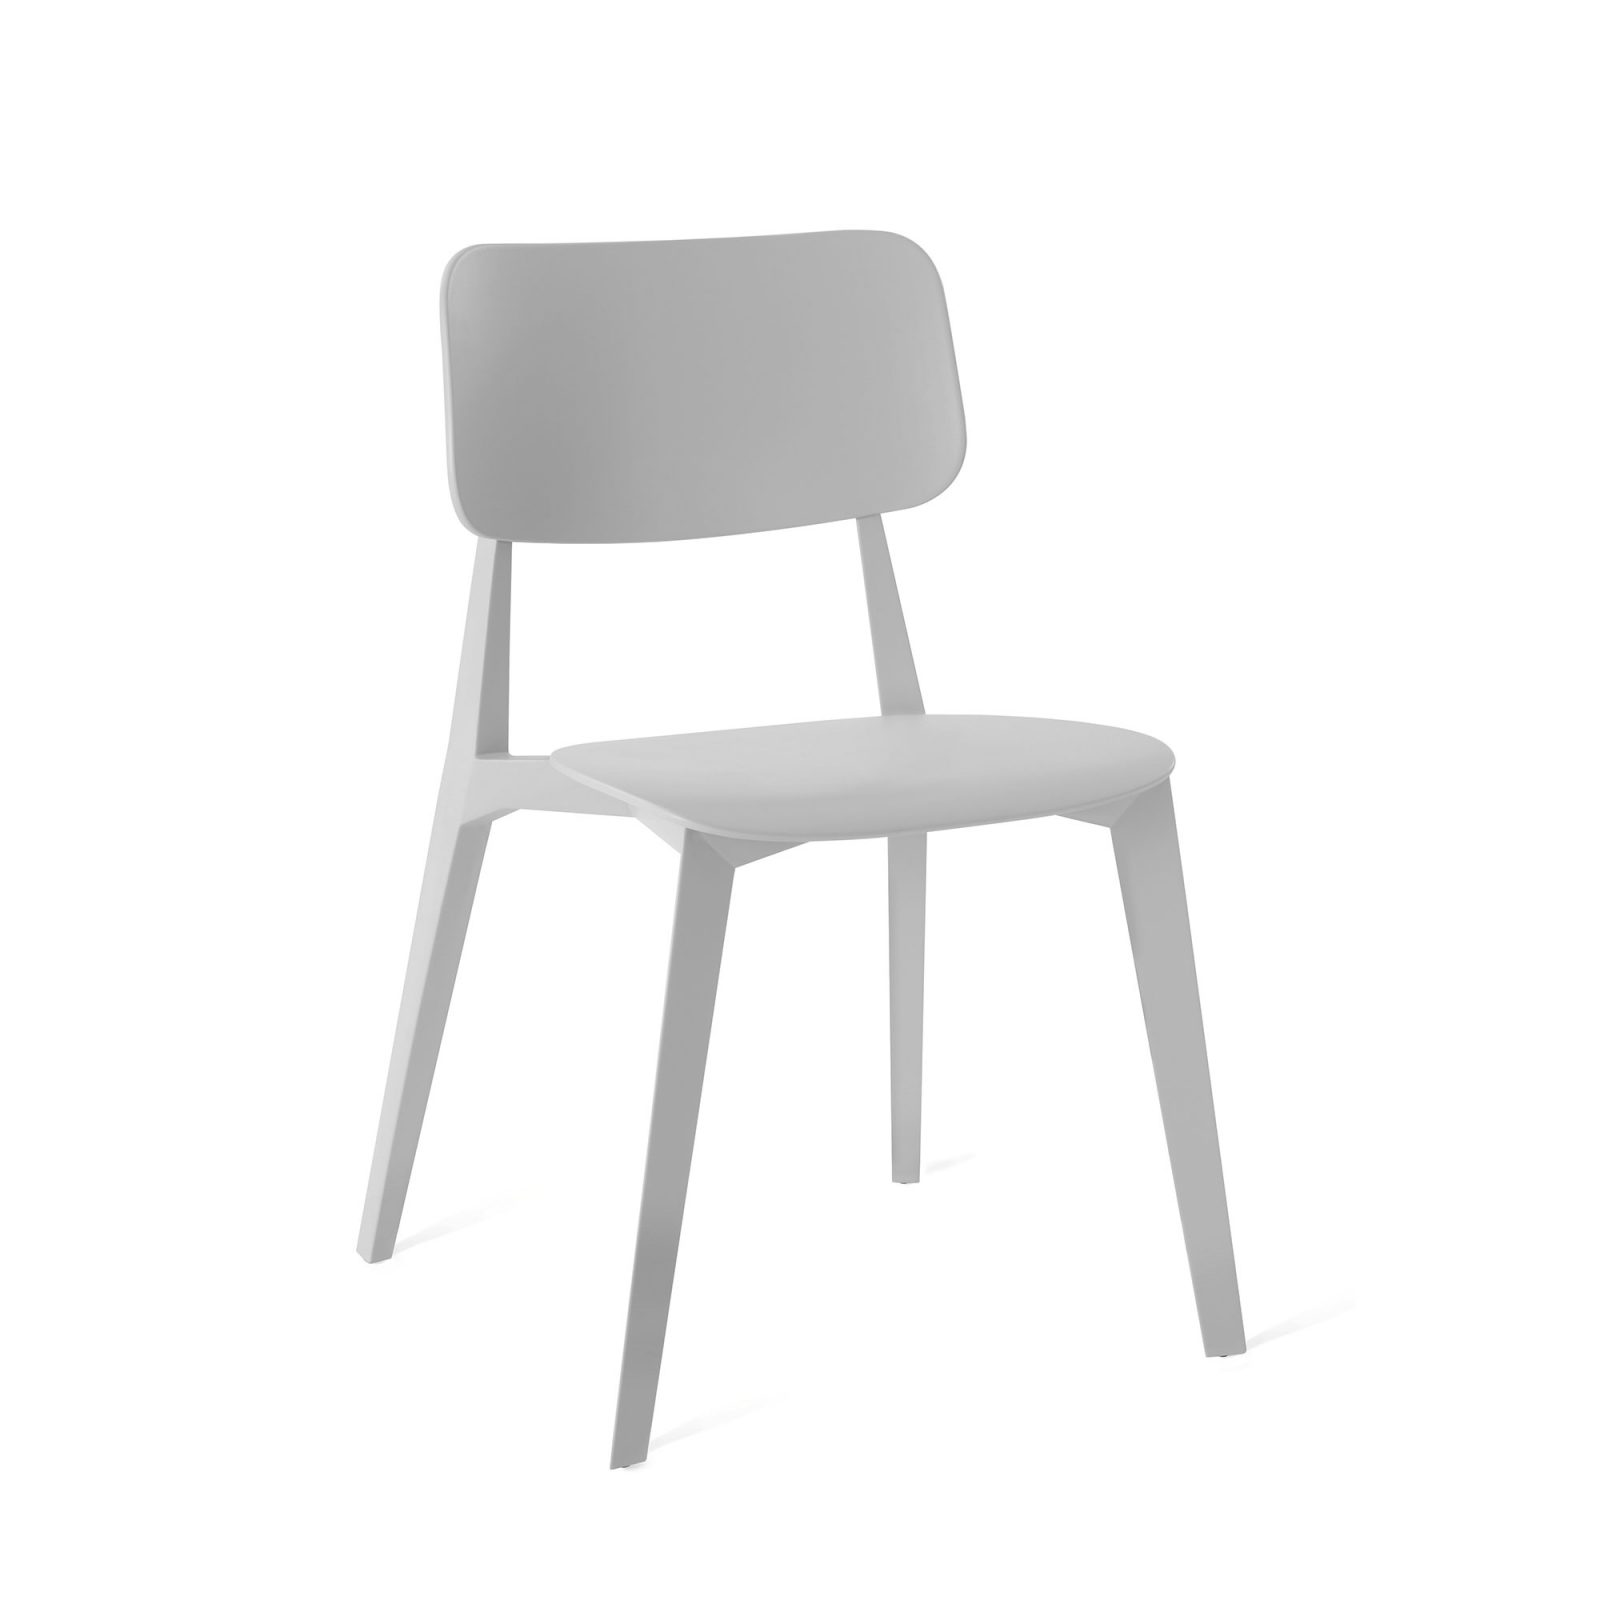 stellar-chair-light-grey-2